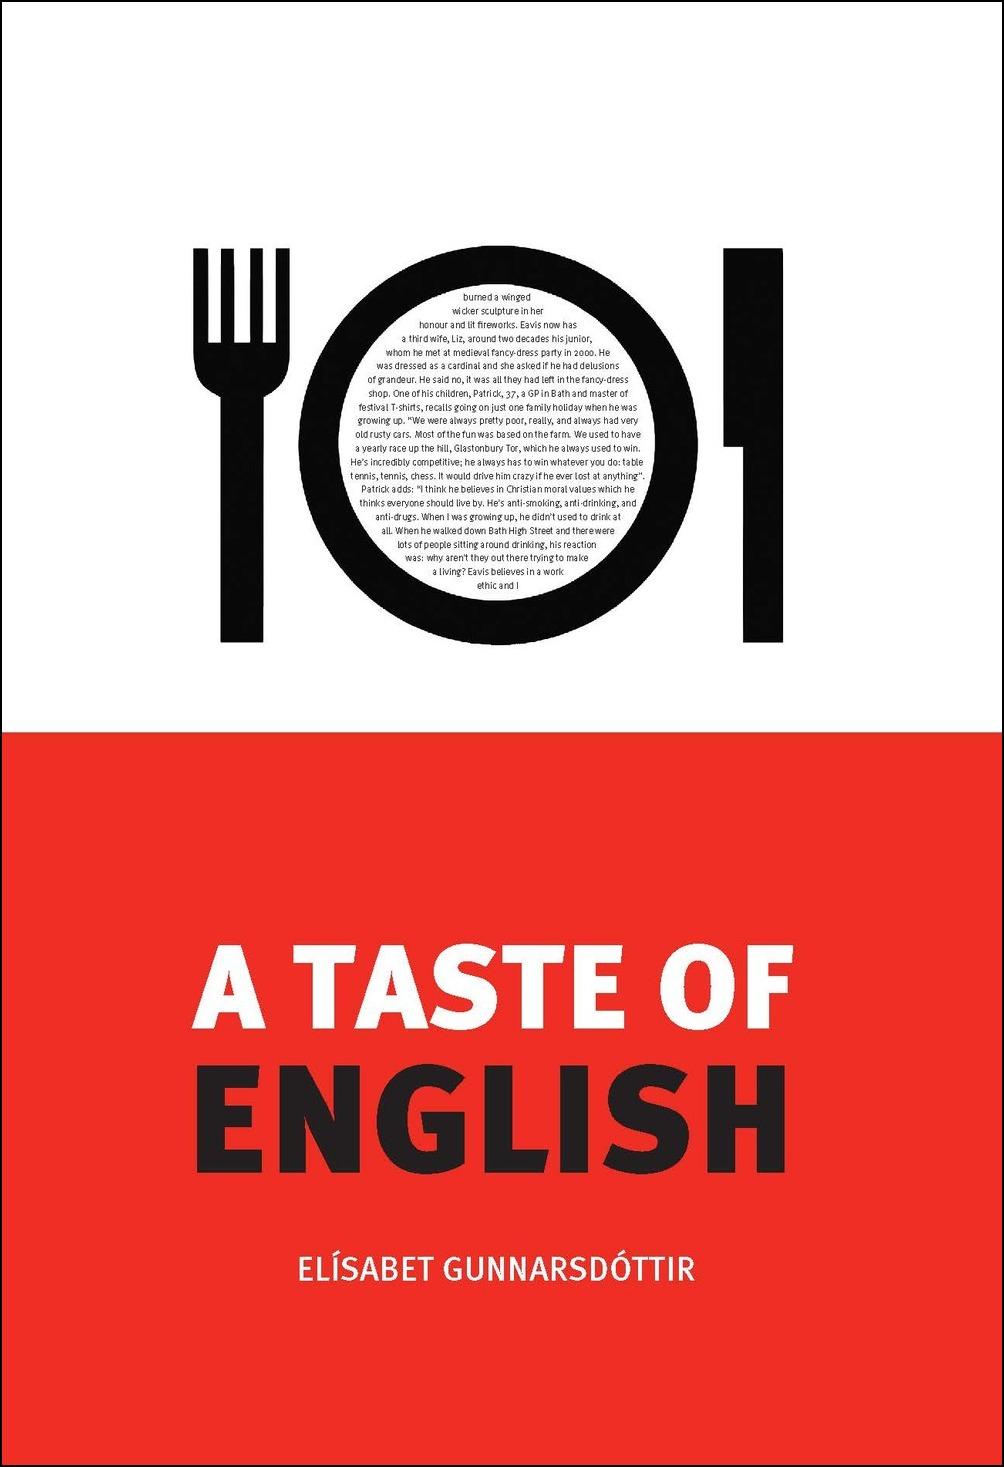 A Taste of English